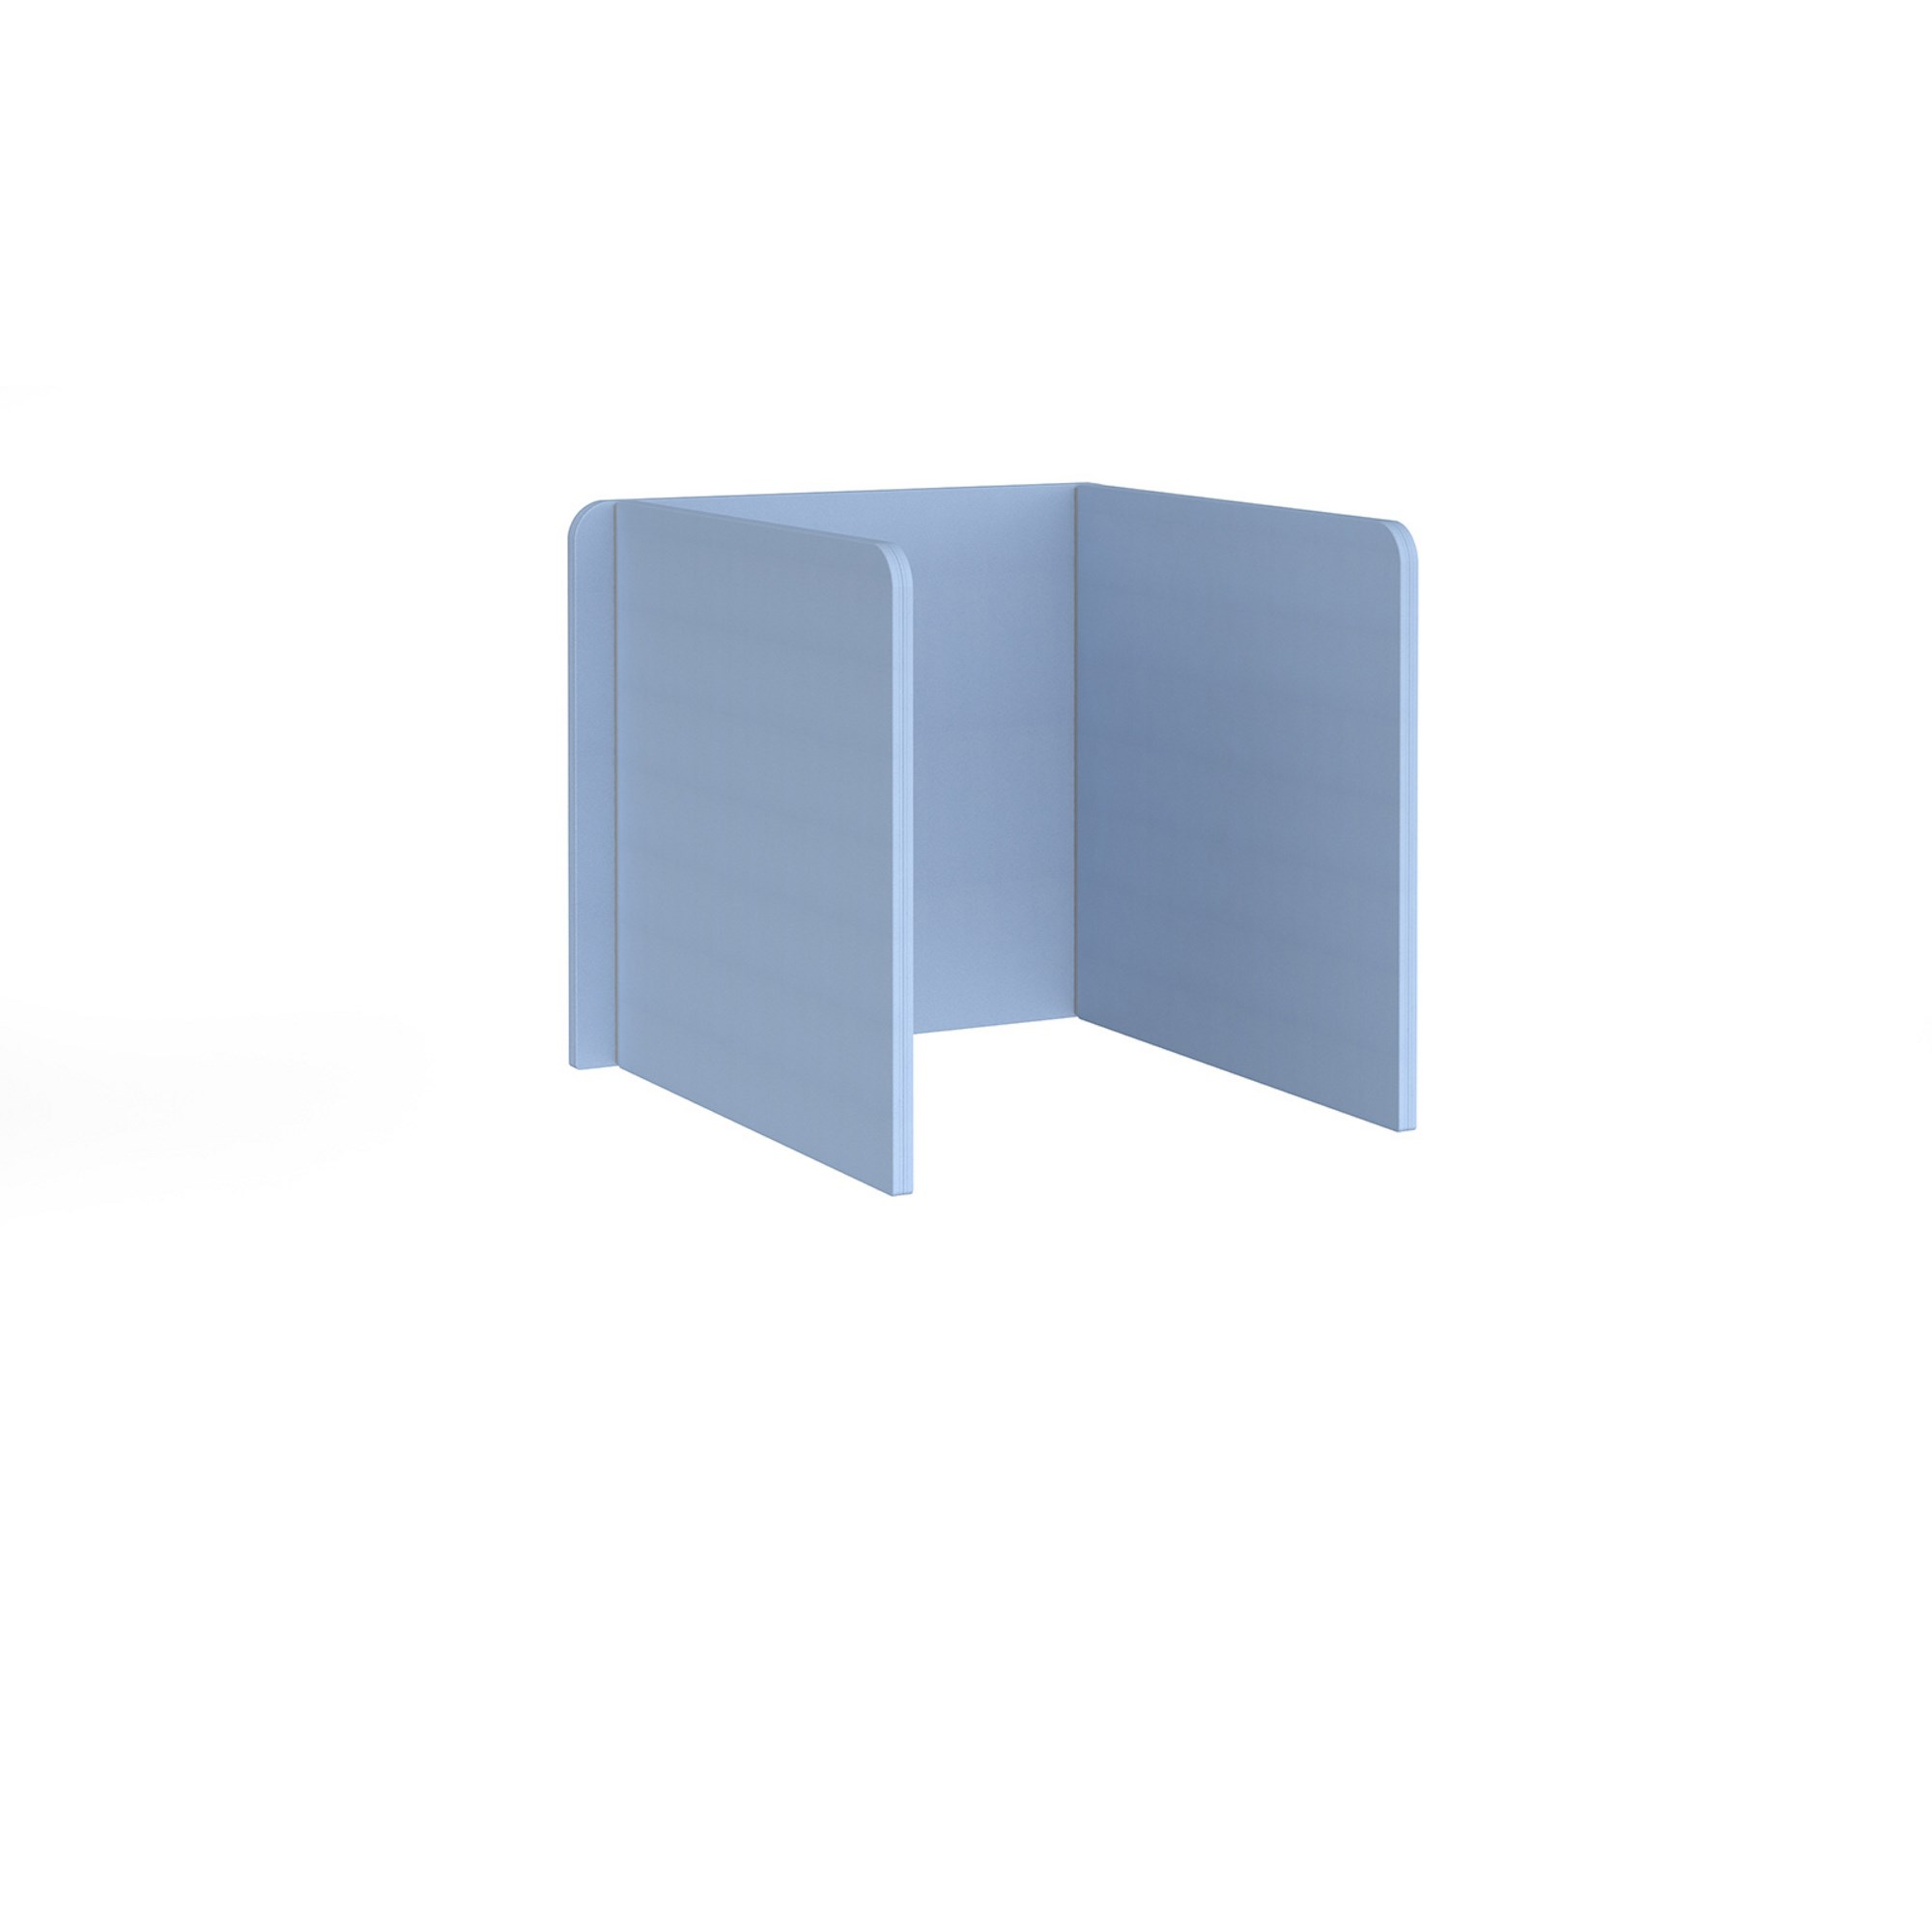 Fabric 3-sided High Screens 785 x 800